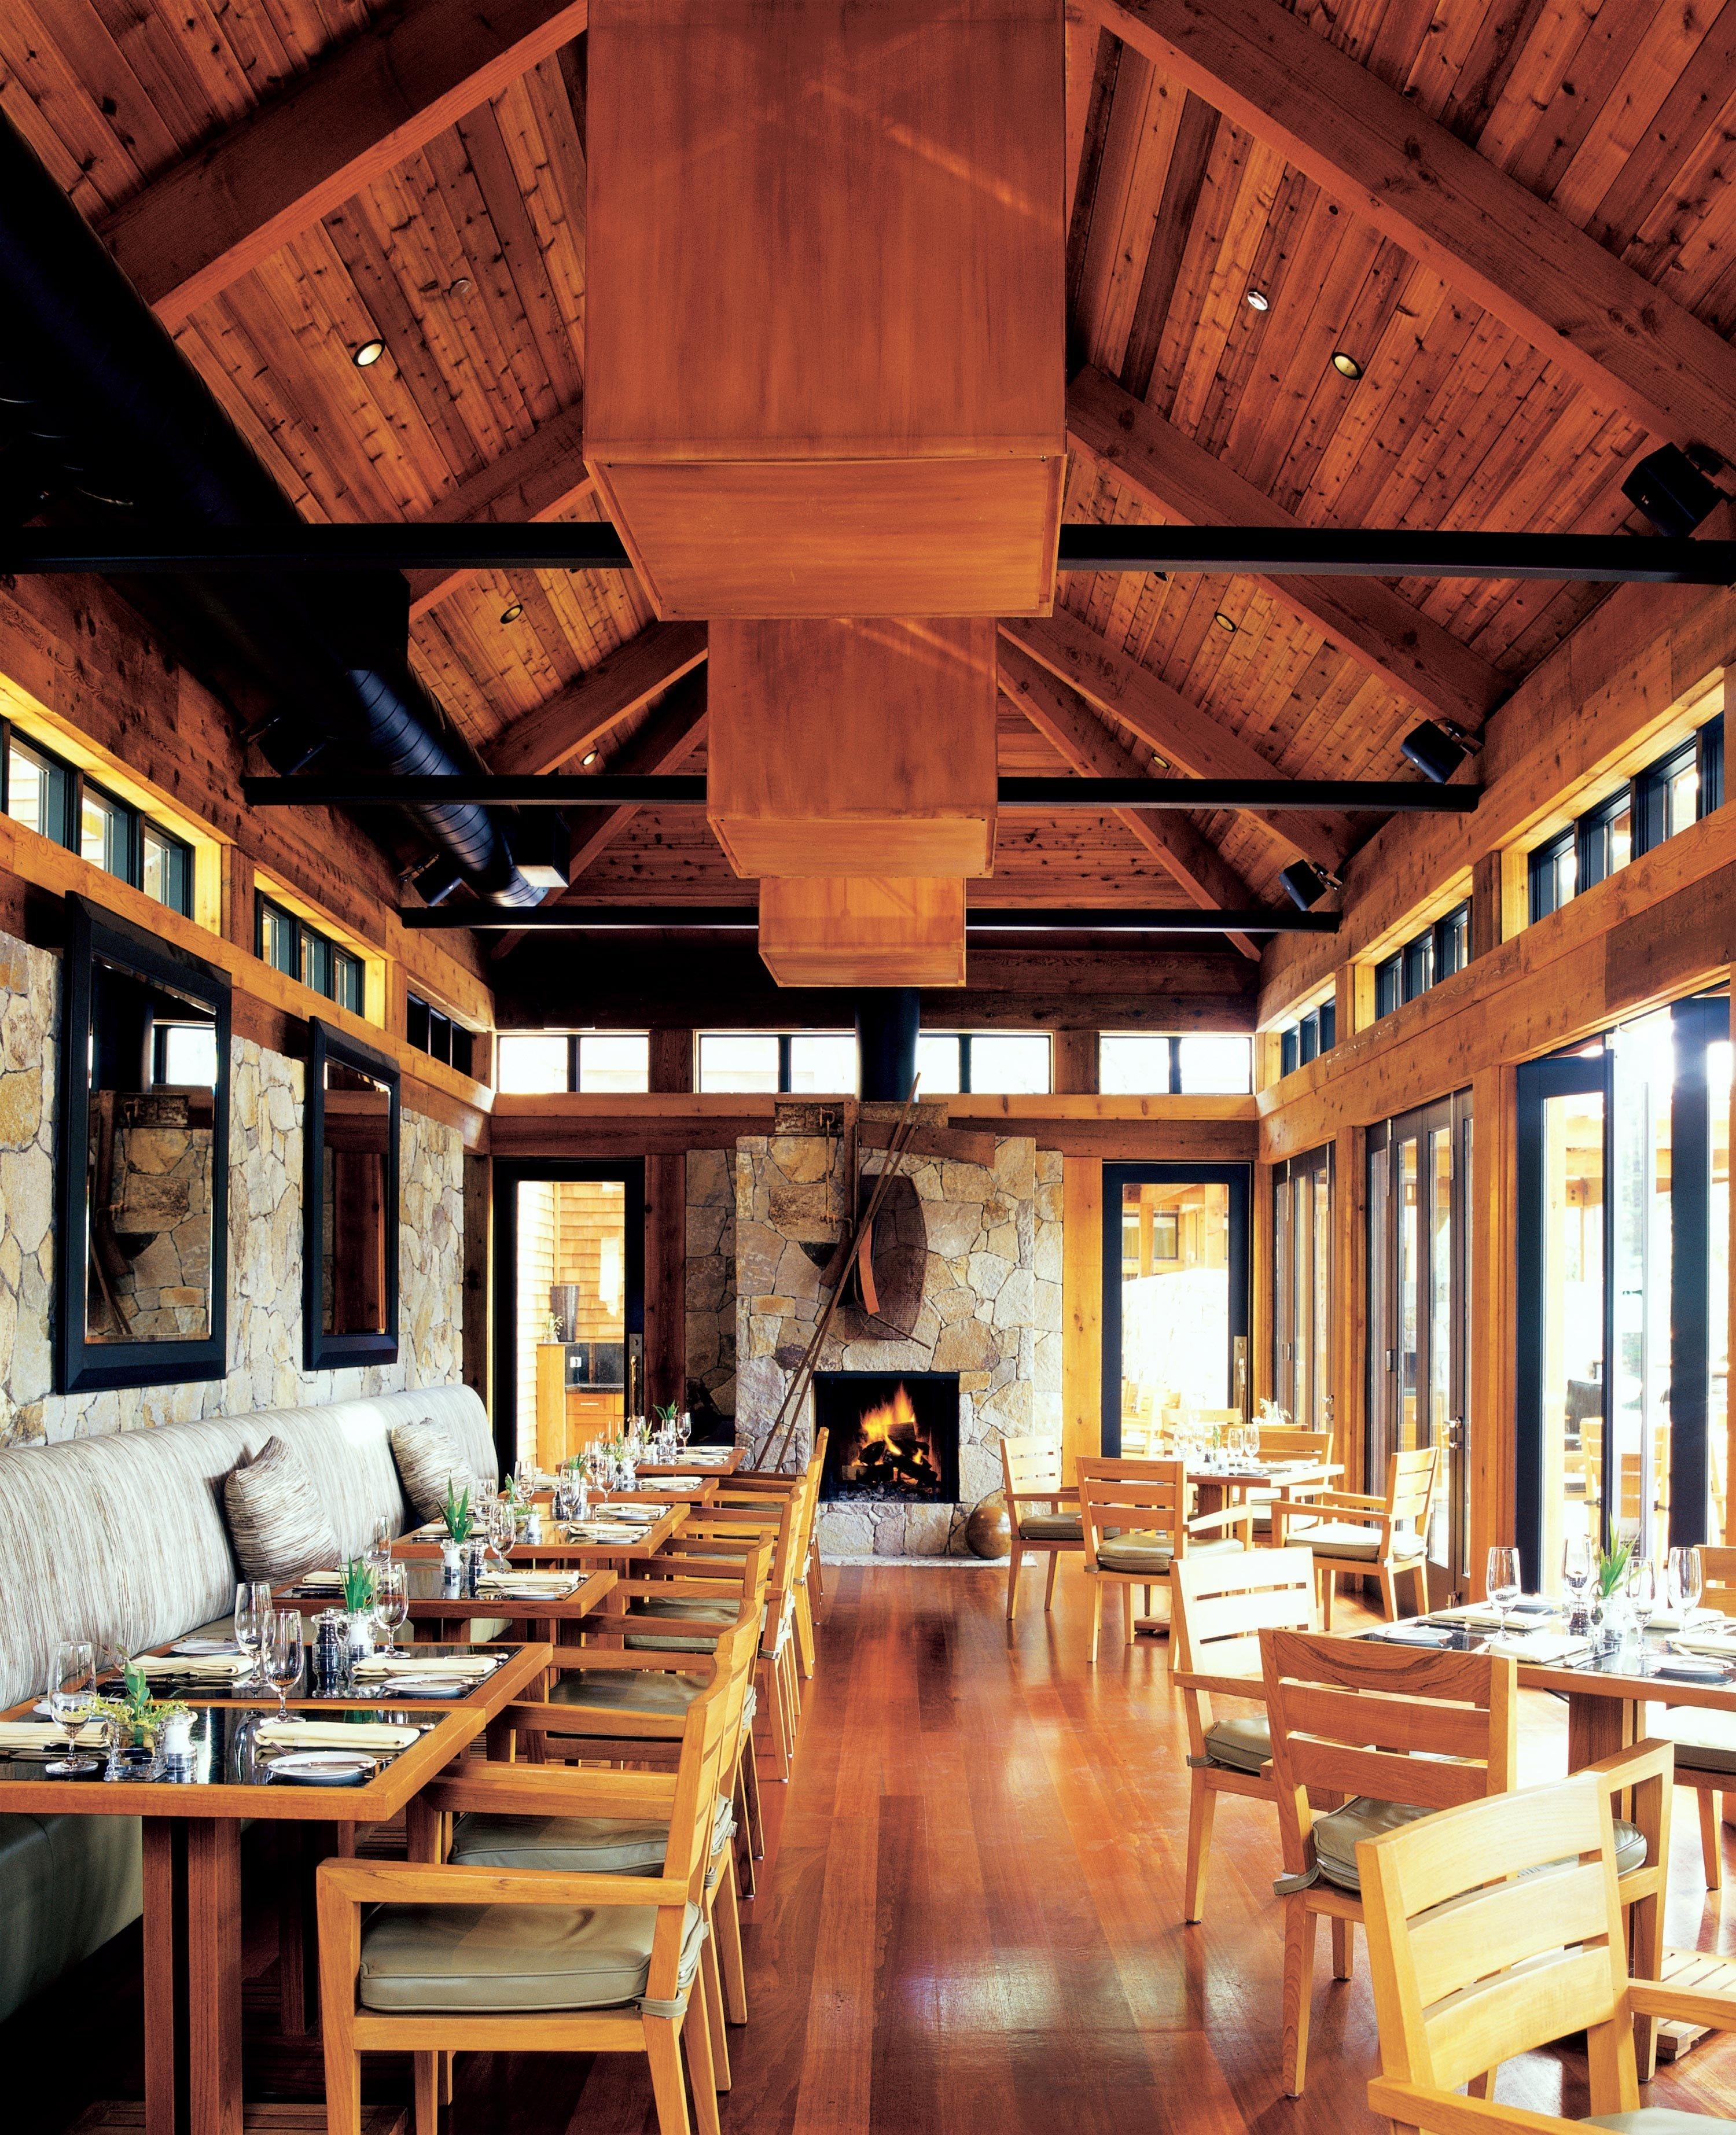 Dining Eat Eco Luxury Ranch Romance Romantic Rustic Wellness building wooden log cabin home restaurant farmhouse tavern living room Resort cottage